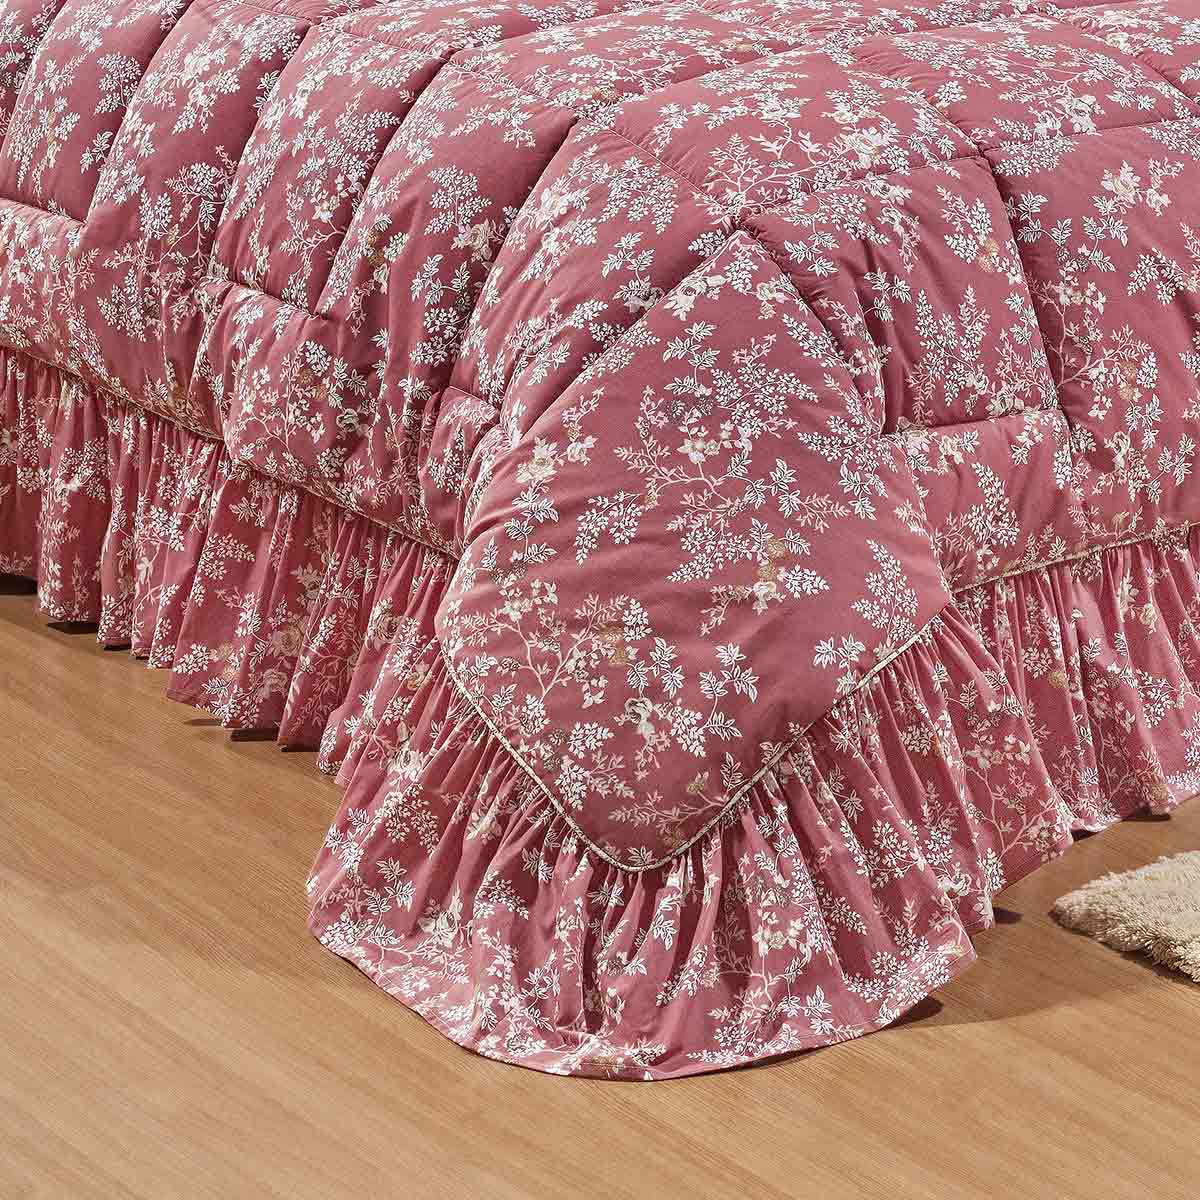 Colcha Casal Super King Kit Bouquet Percal 200 Fios Florida com 20 peças